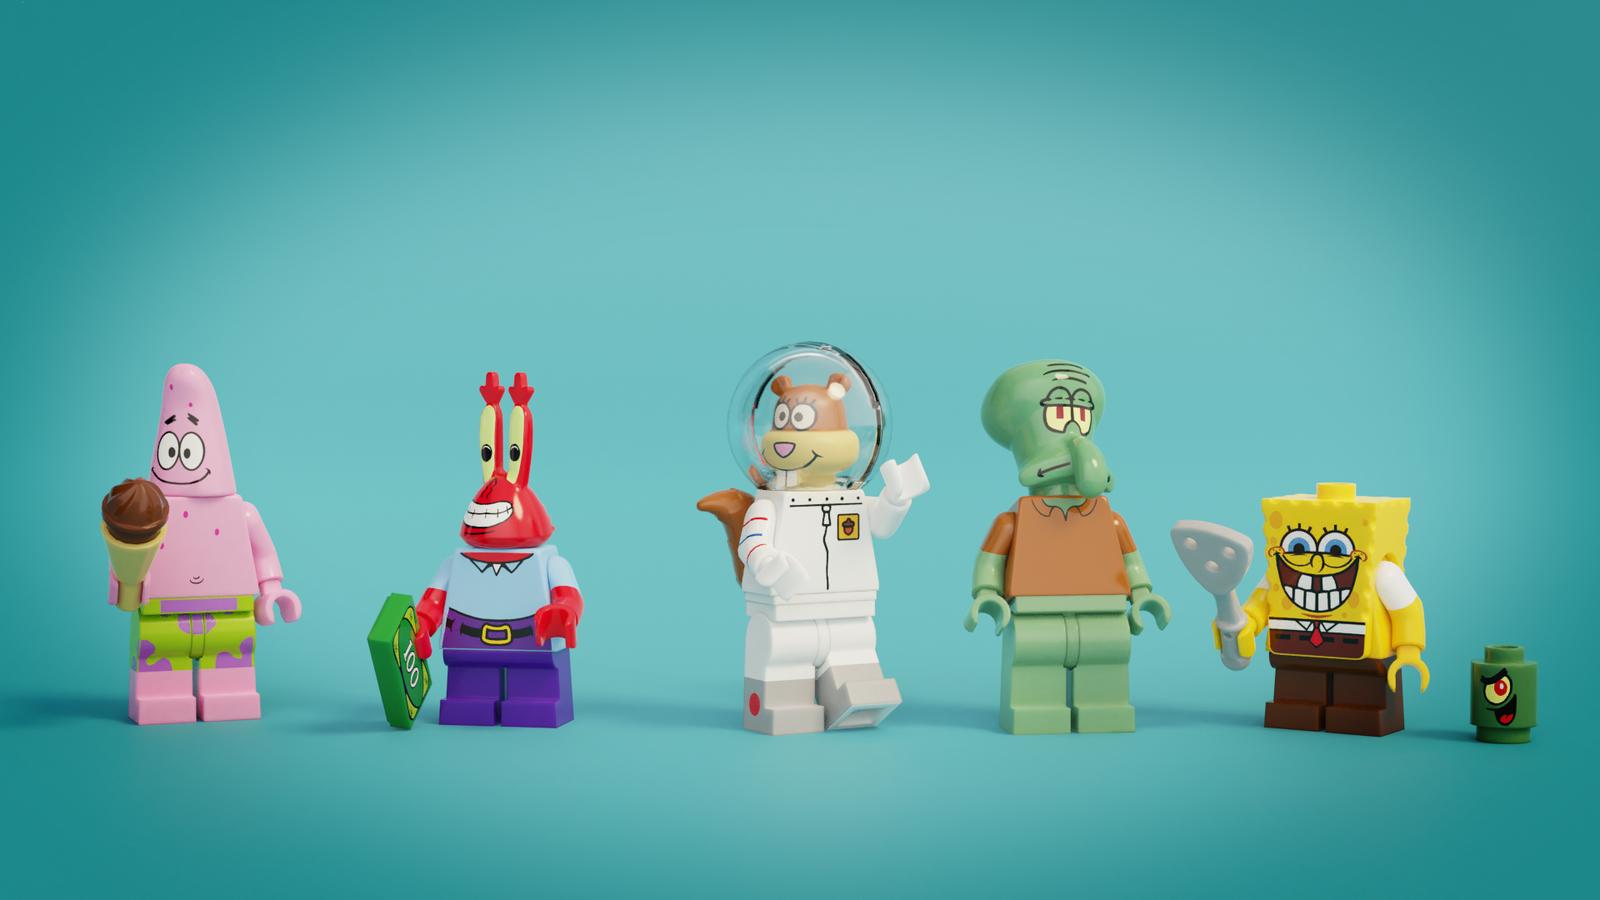 lego-ideas-spongebob-squarepants-the-krusty-krab-exe-sandbox-4 zusammengebaut.com